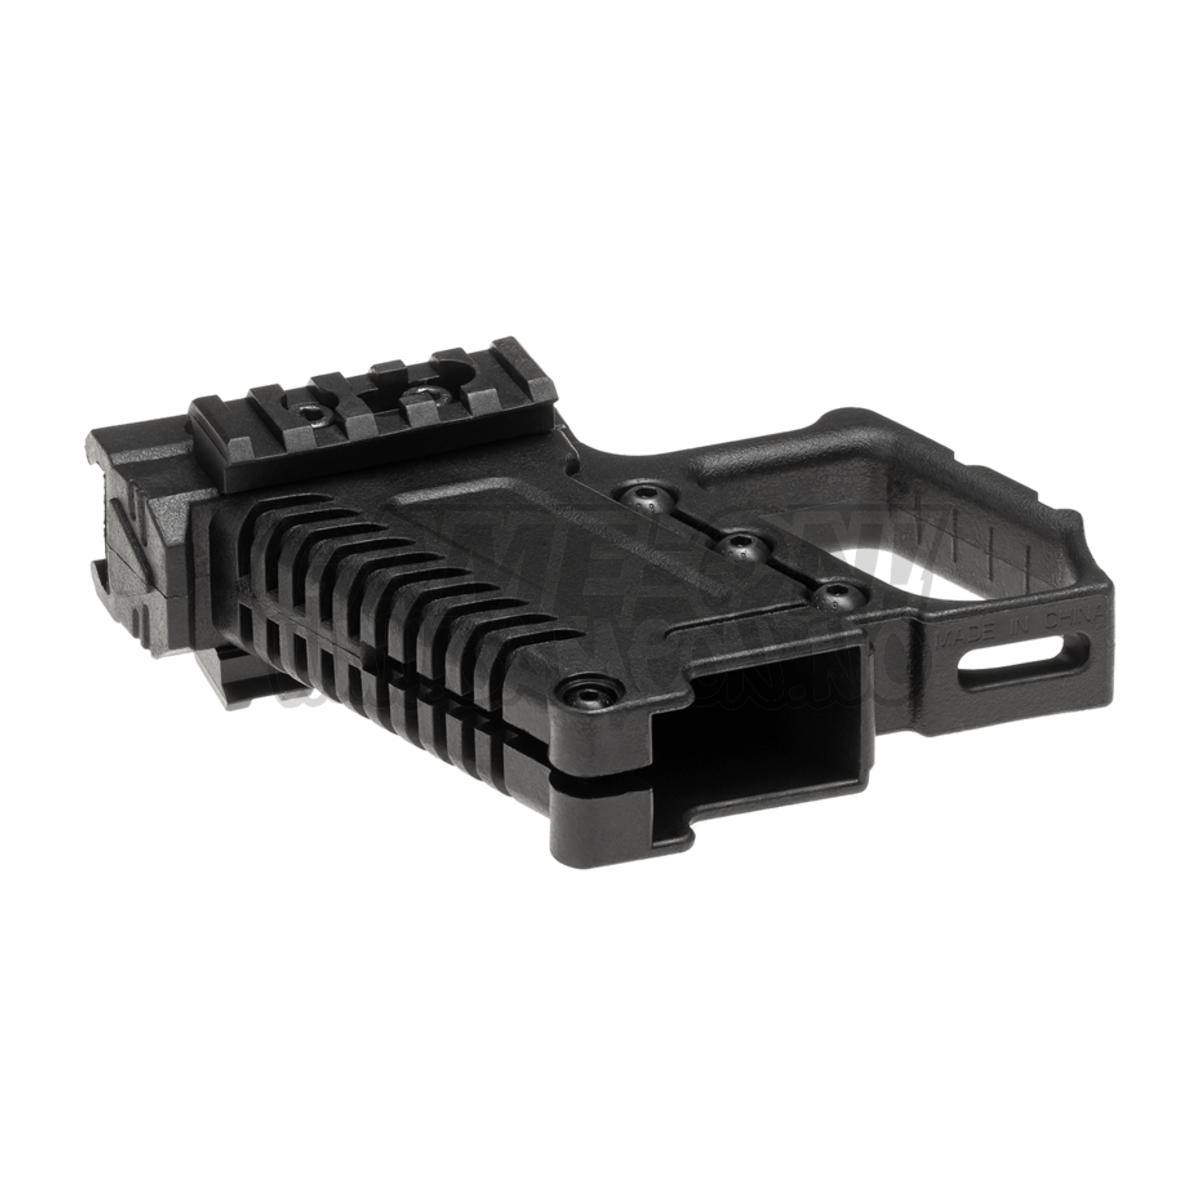 Pirate Arms - Glock Carbine Konvertering Kit - Svart